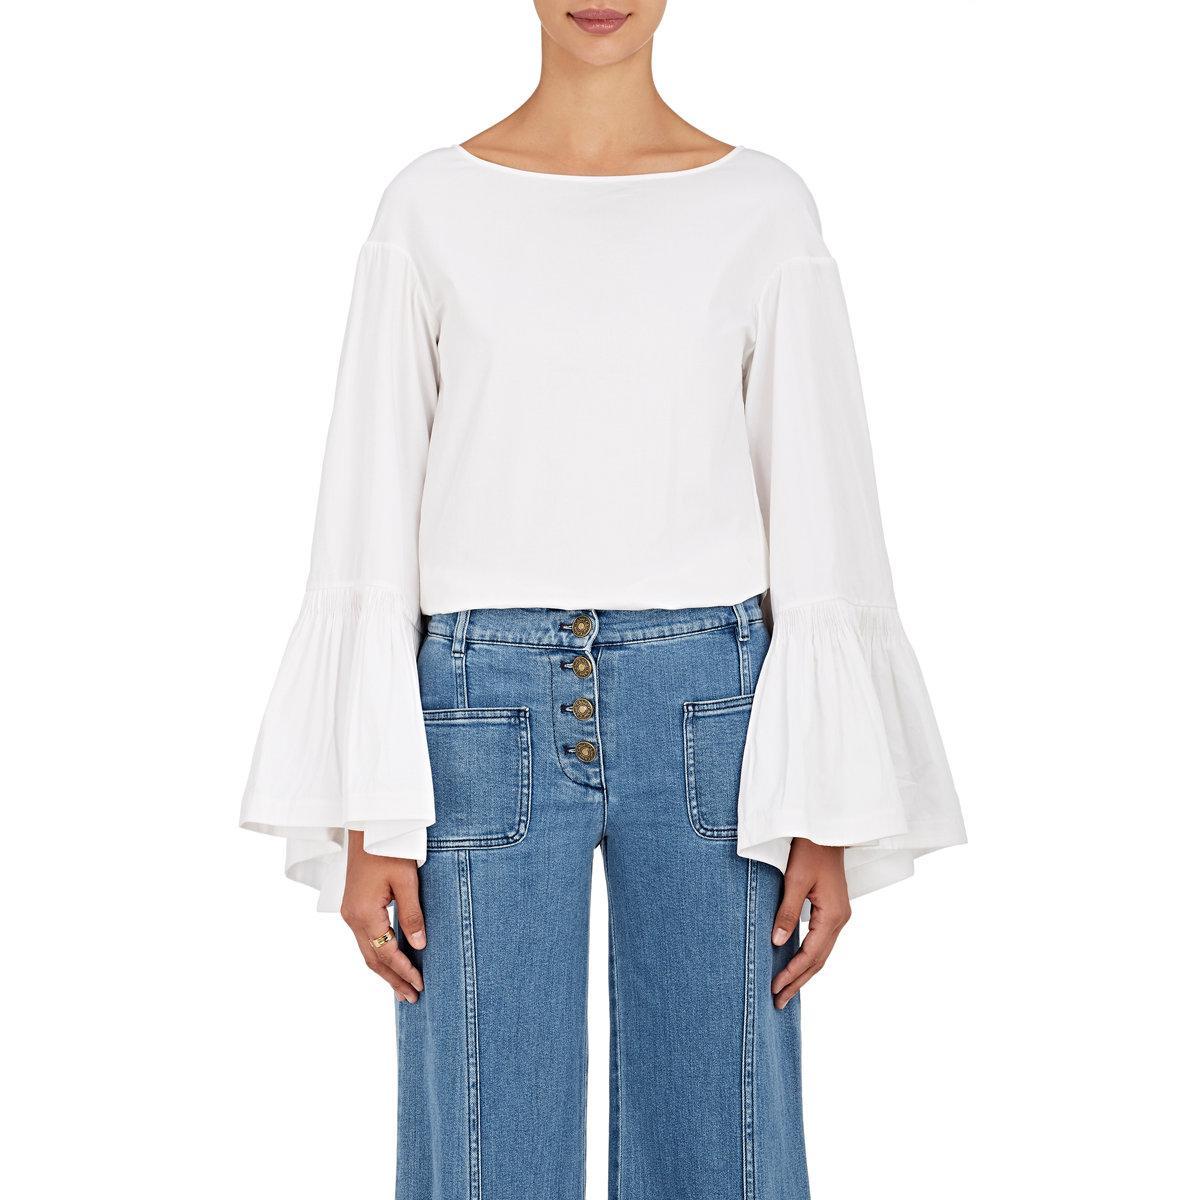 Womens Paita Gingham Cotton Blouse Teija Free Shipping Cheap Quality mXYv0NTryk